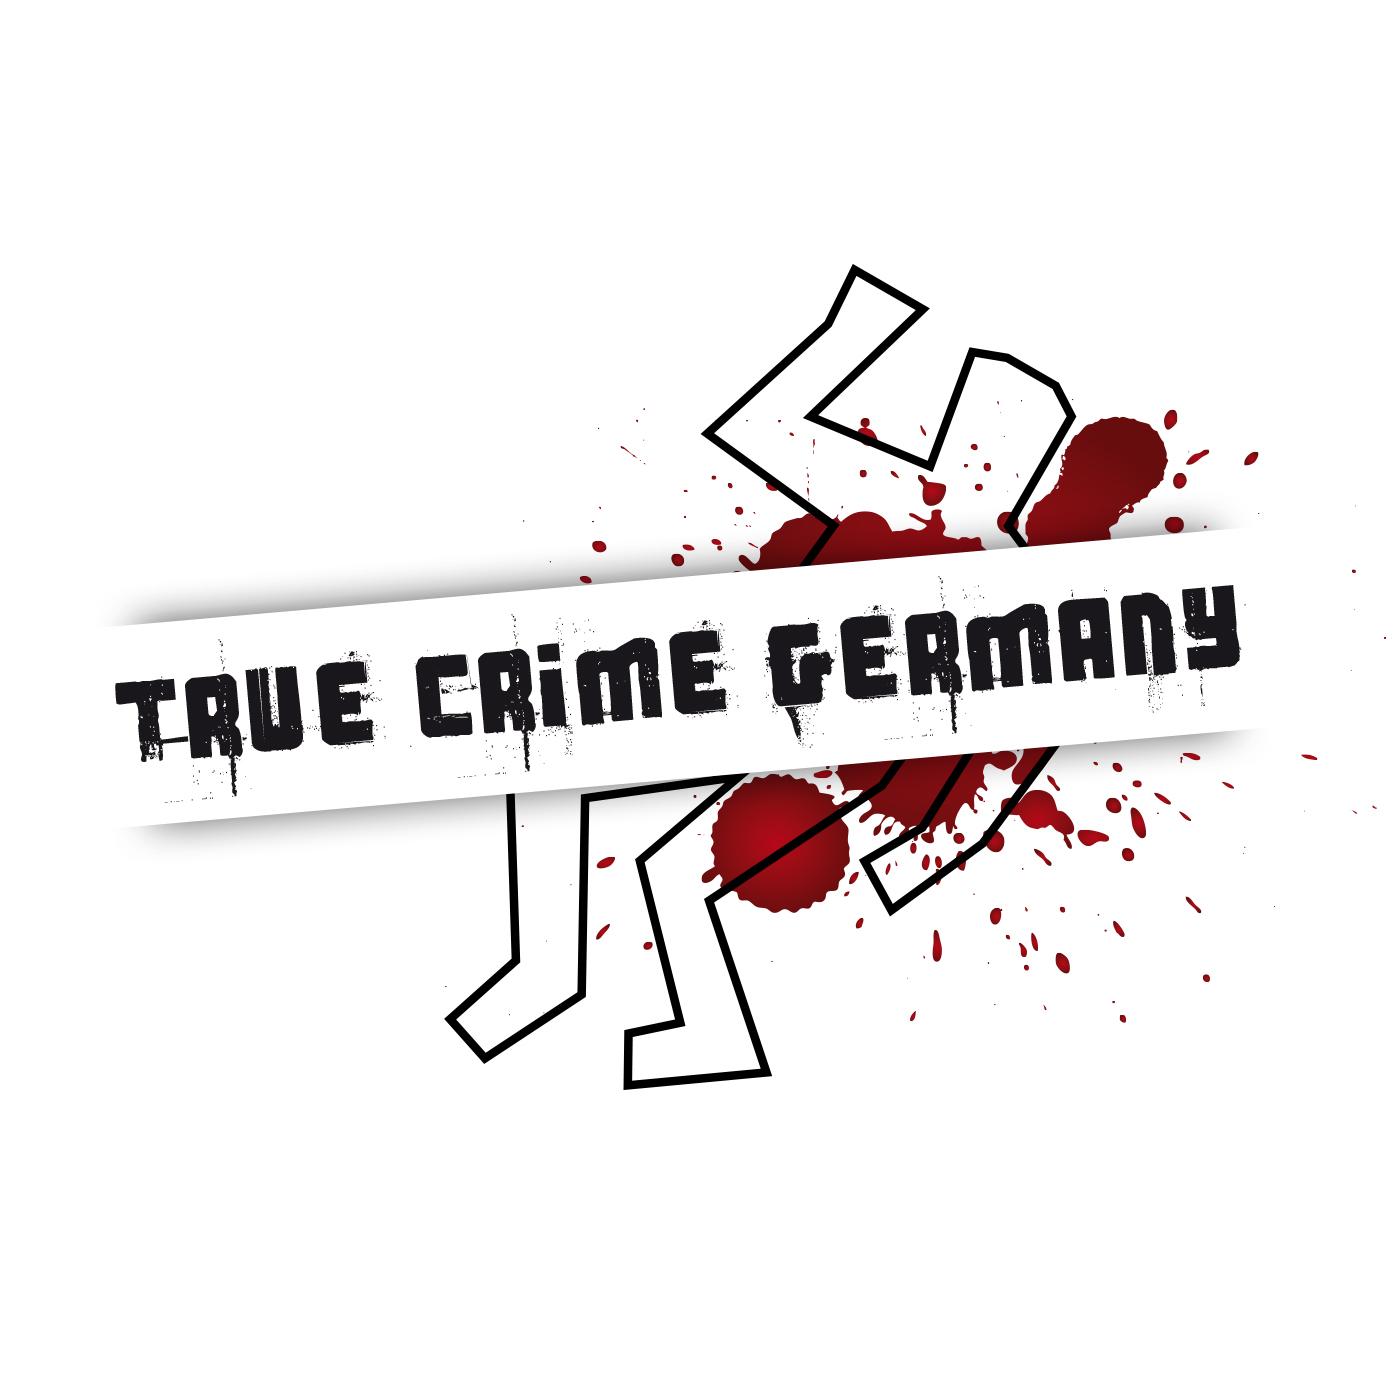 True Crime Germany logo